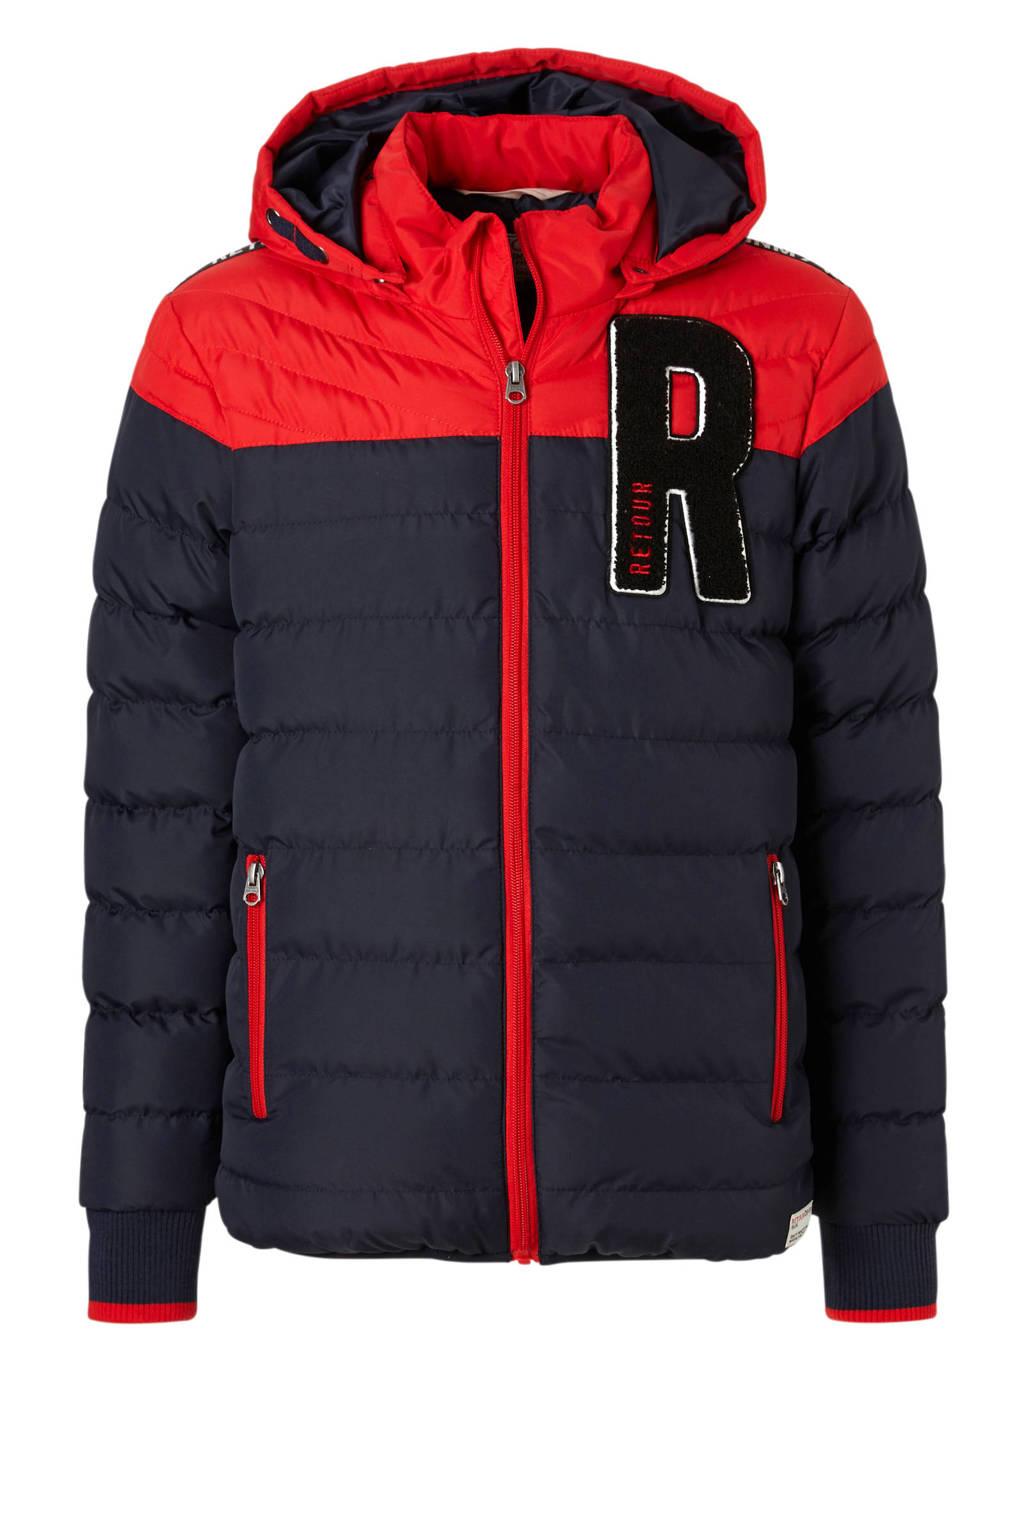 Retour Denim winterjas Milan blauw/rood, Donkerblauw/rood